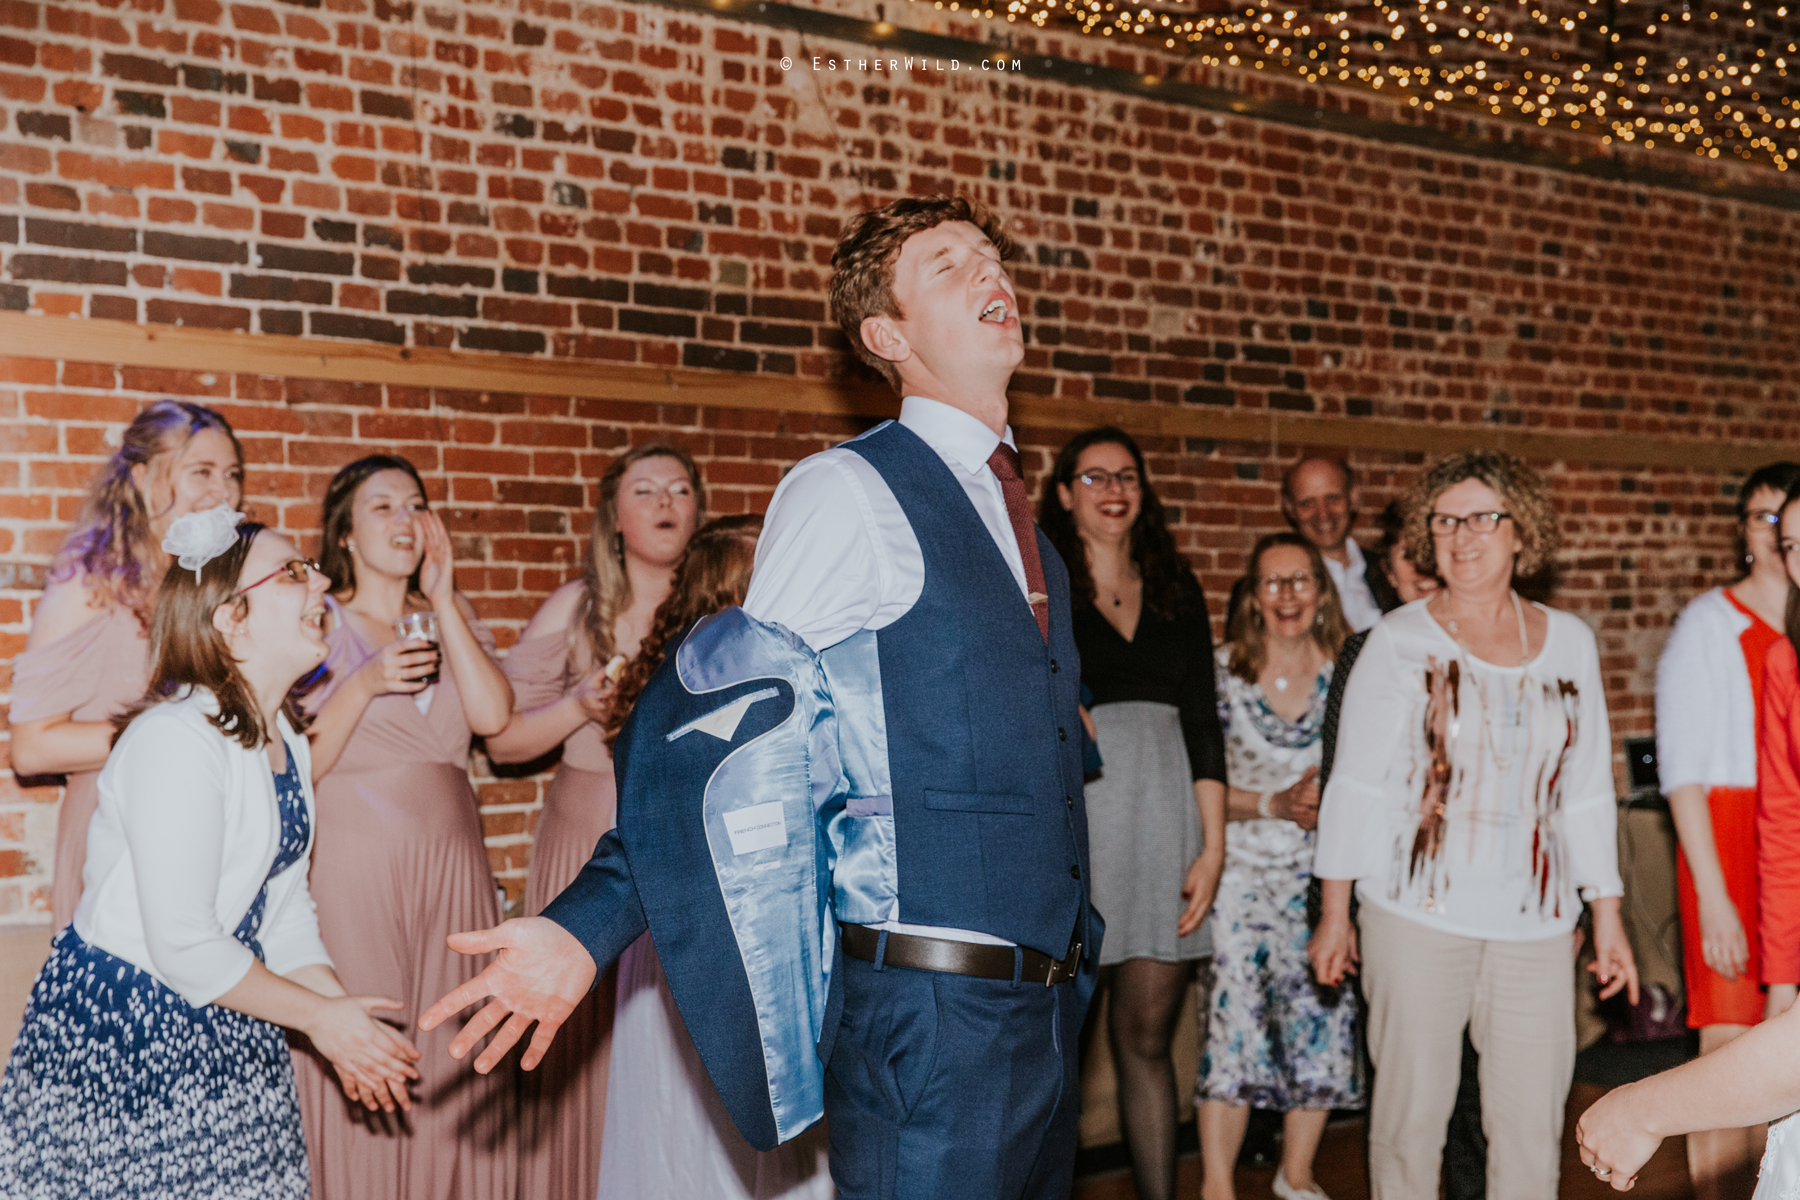 Glebe_Farm_Barn_Rustic_Norfolk_Wedding_Esther_Wild_Photographer_Copyright_IMG_3184.jpg